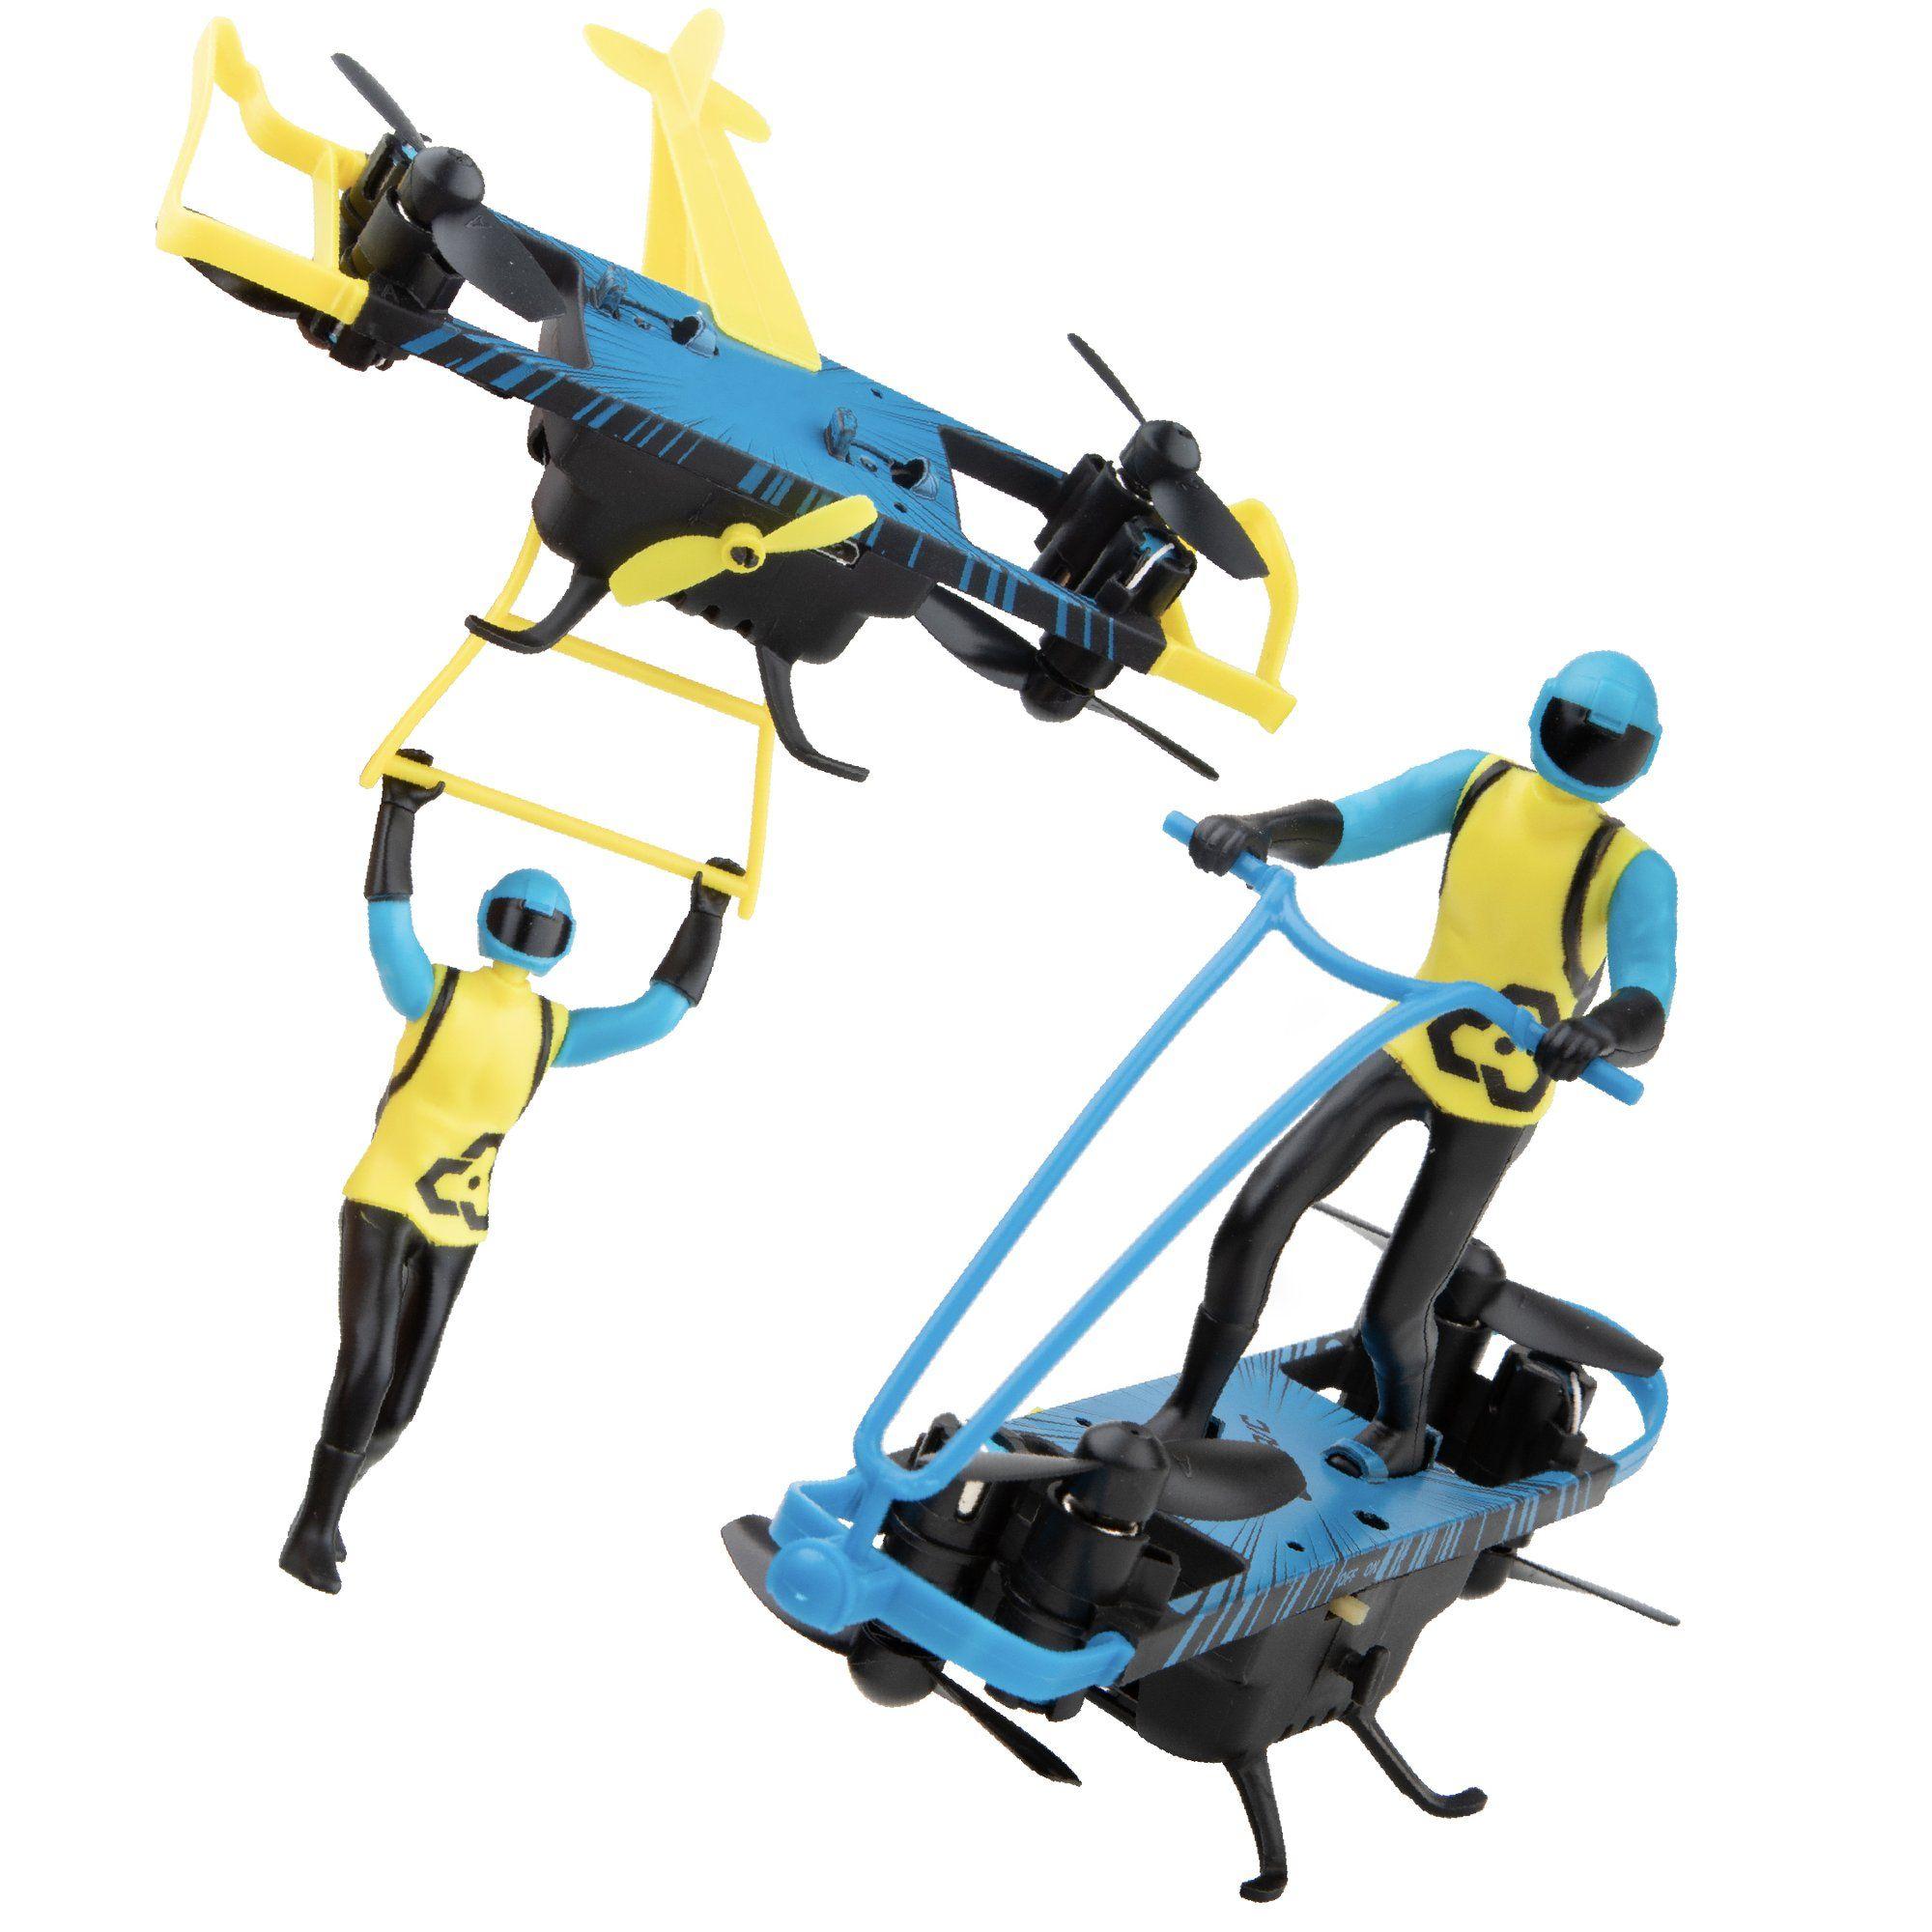 Stunt Riders 2in1 Mini Drone with Remote Control and